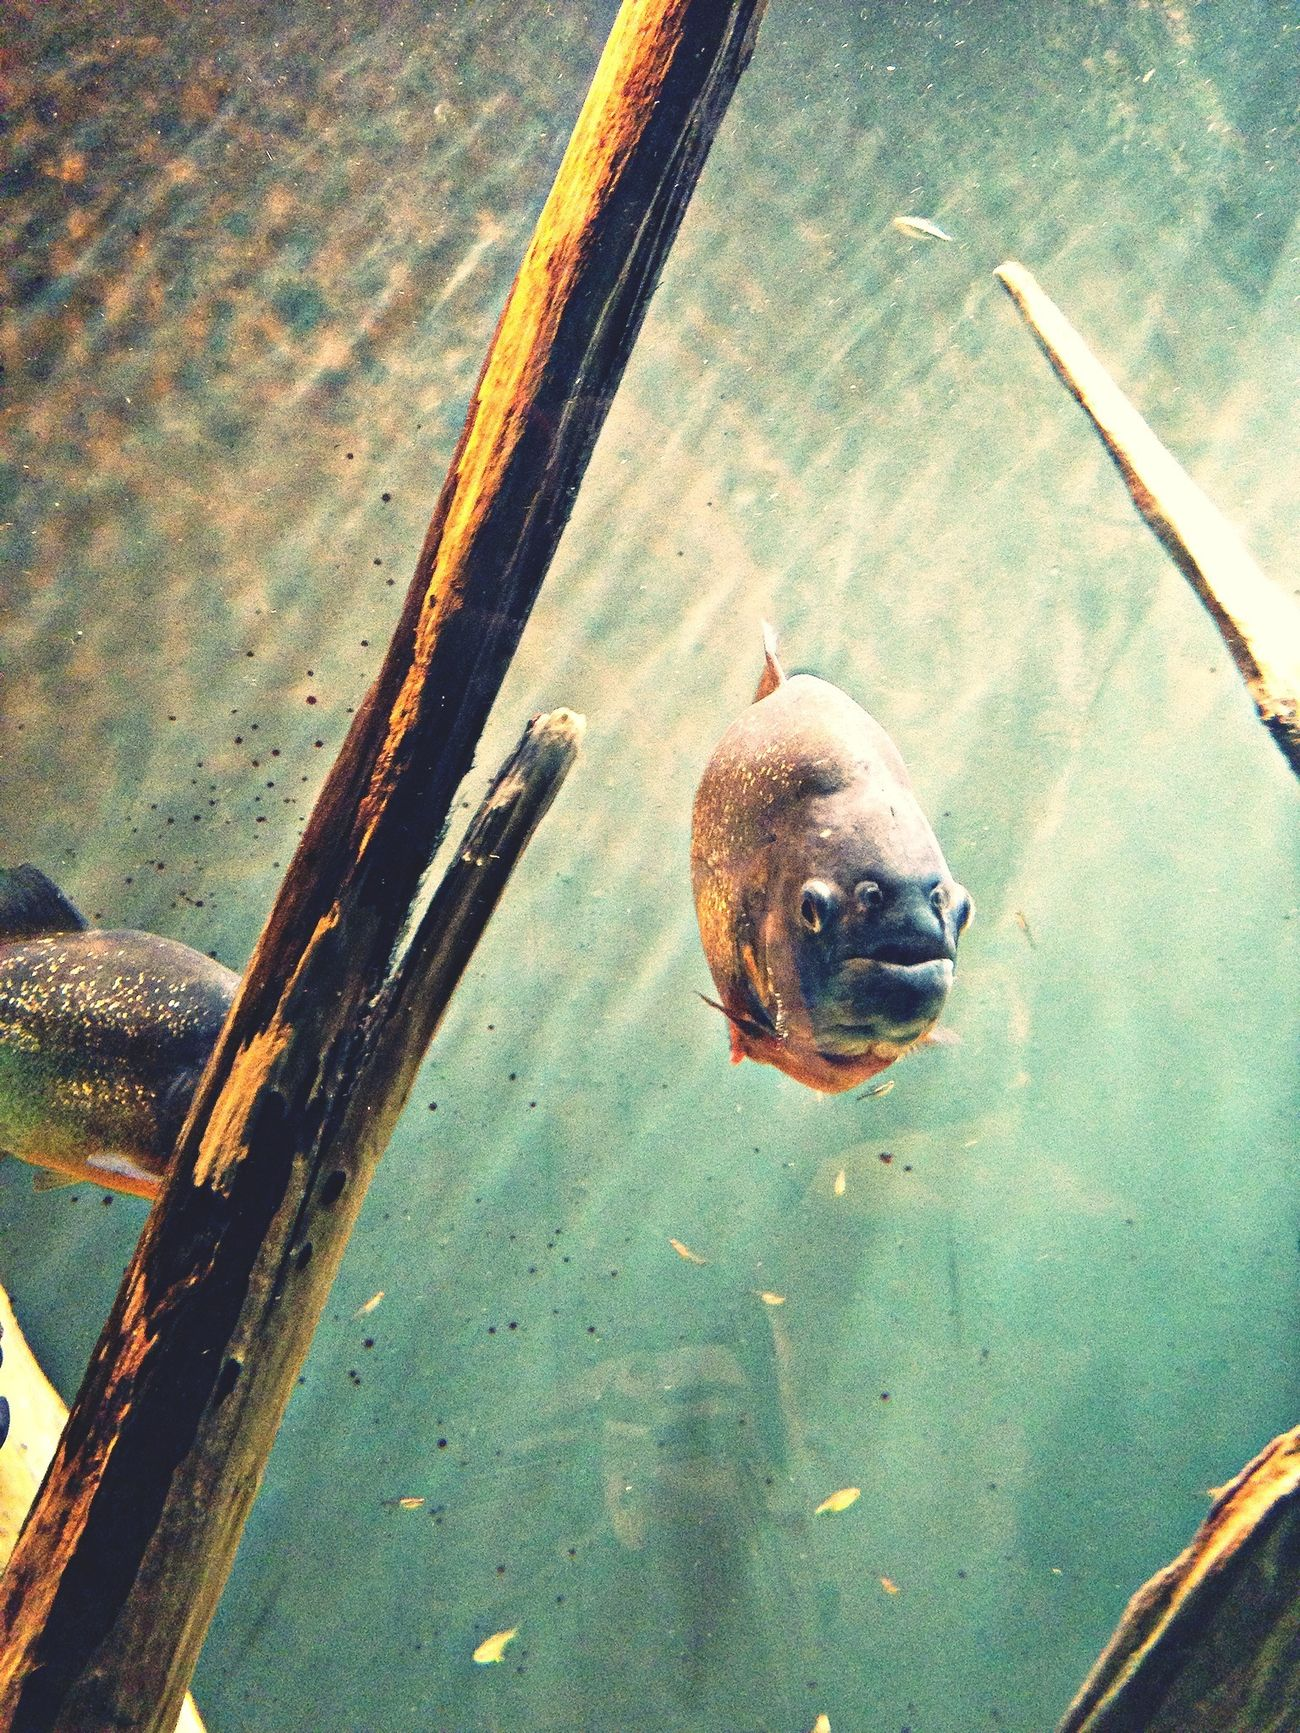 piranha tank at biodome Piranhas Fishtank Biodome Montréal